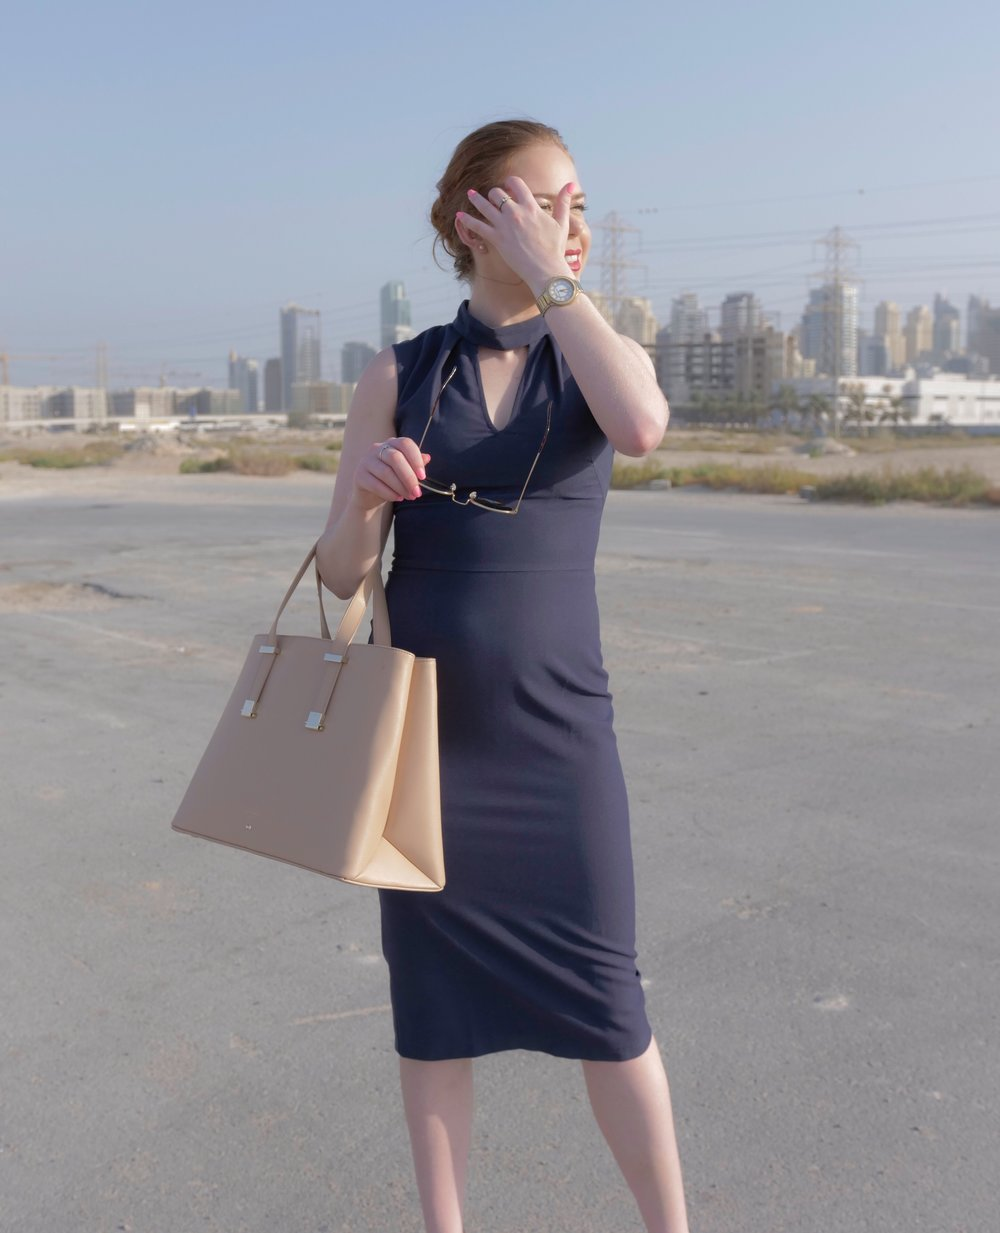 office fashion and workwear - deals in high heels - briar prestidge